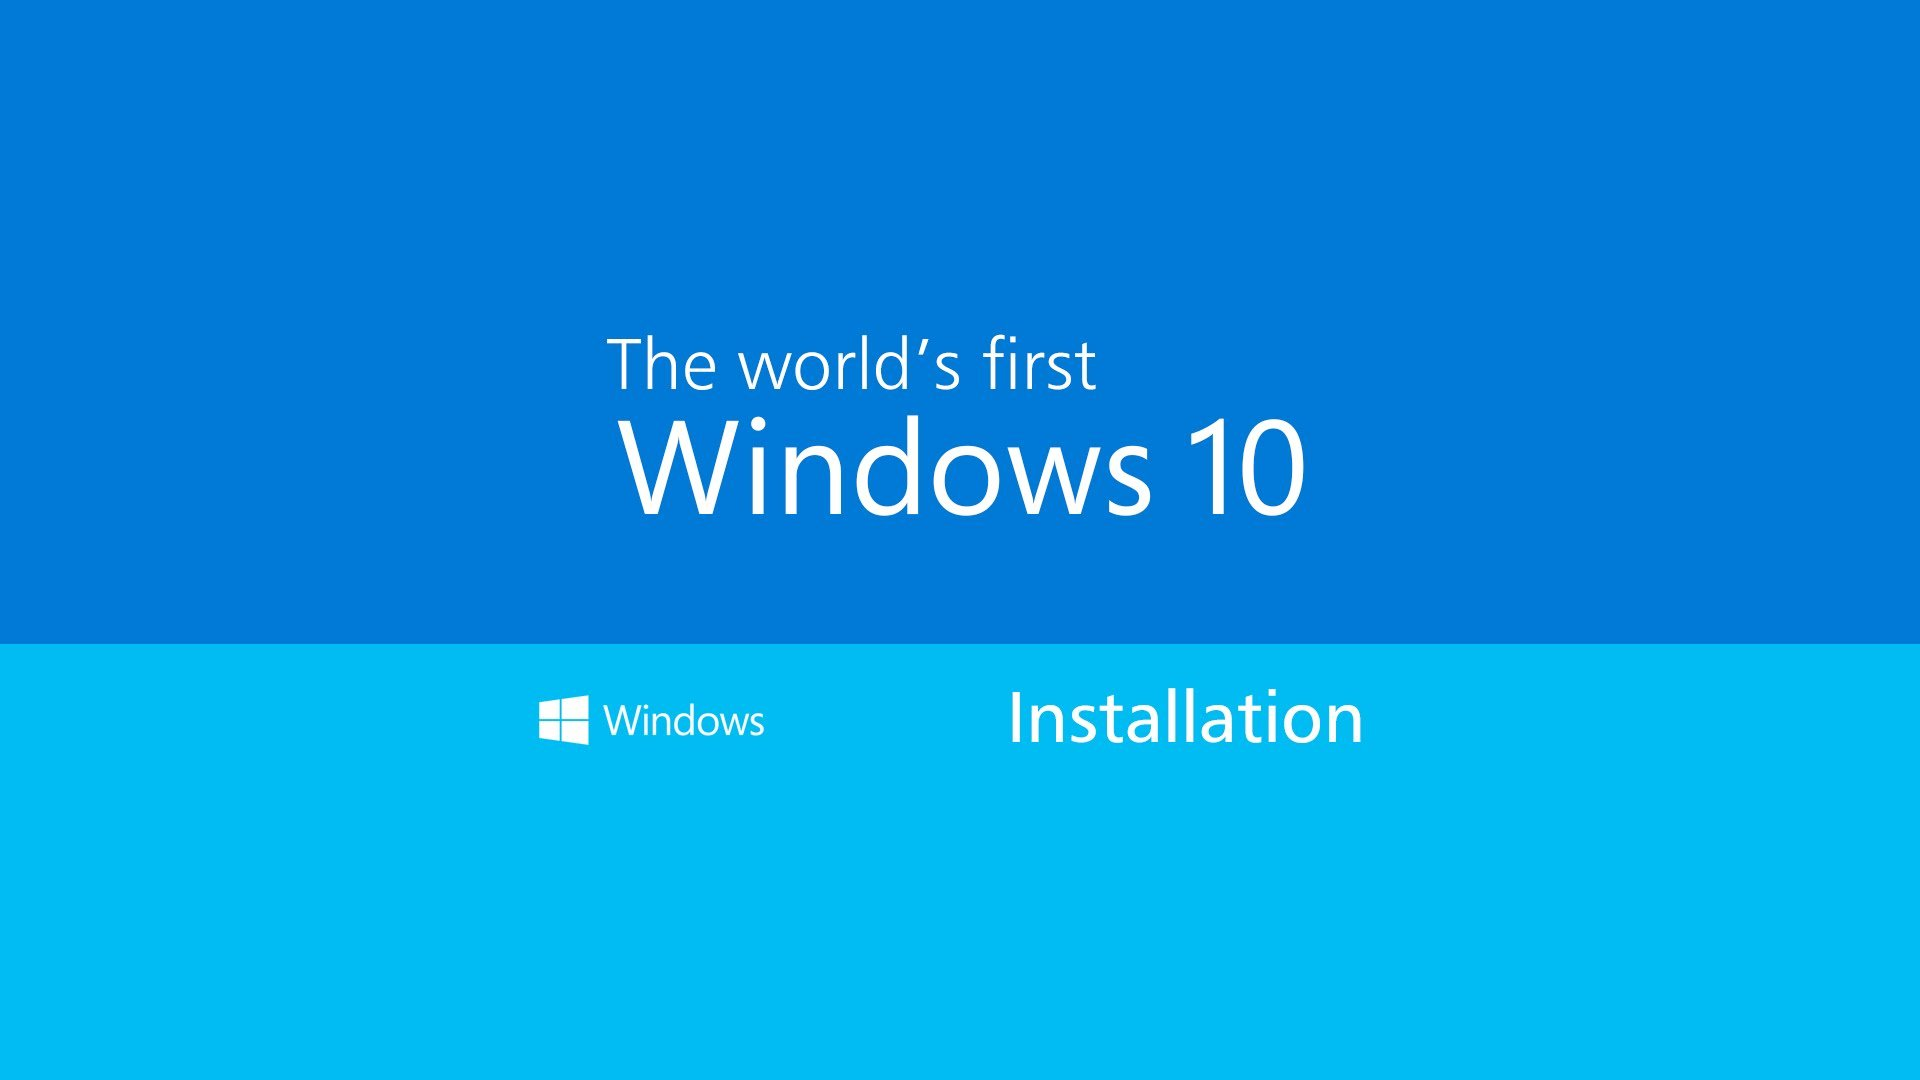 Windows 10 microsoft computer wallpaper 1920x1080 for Microsoft win10